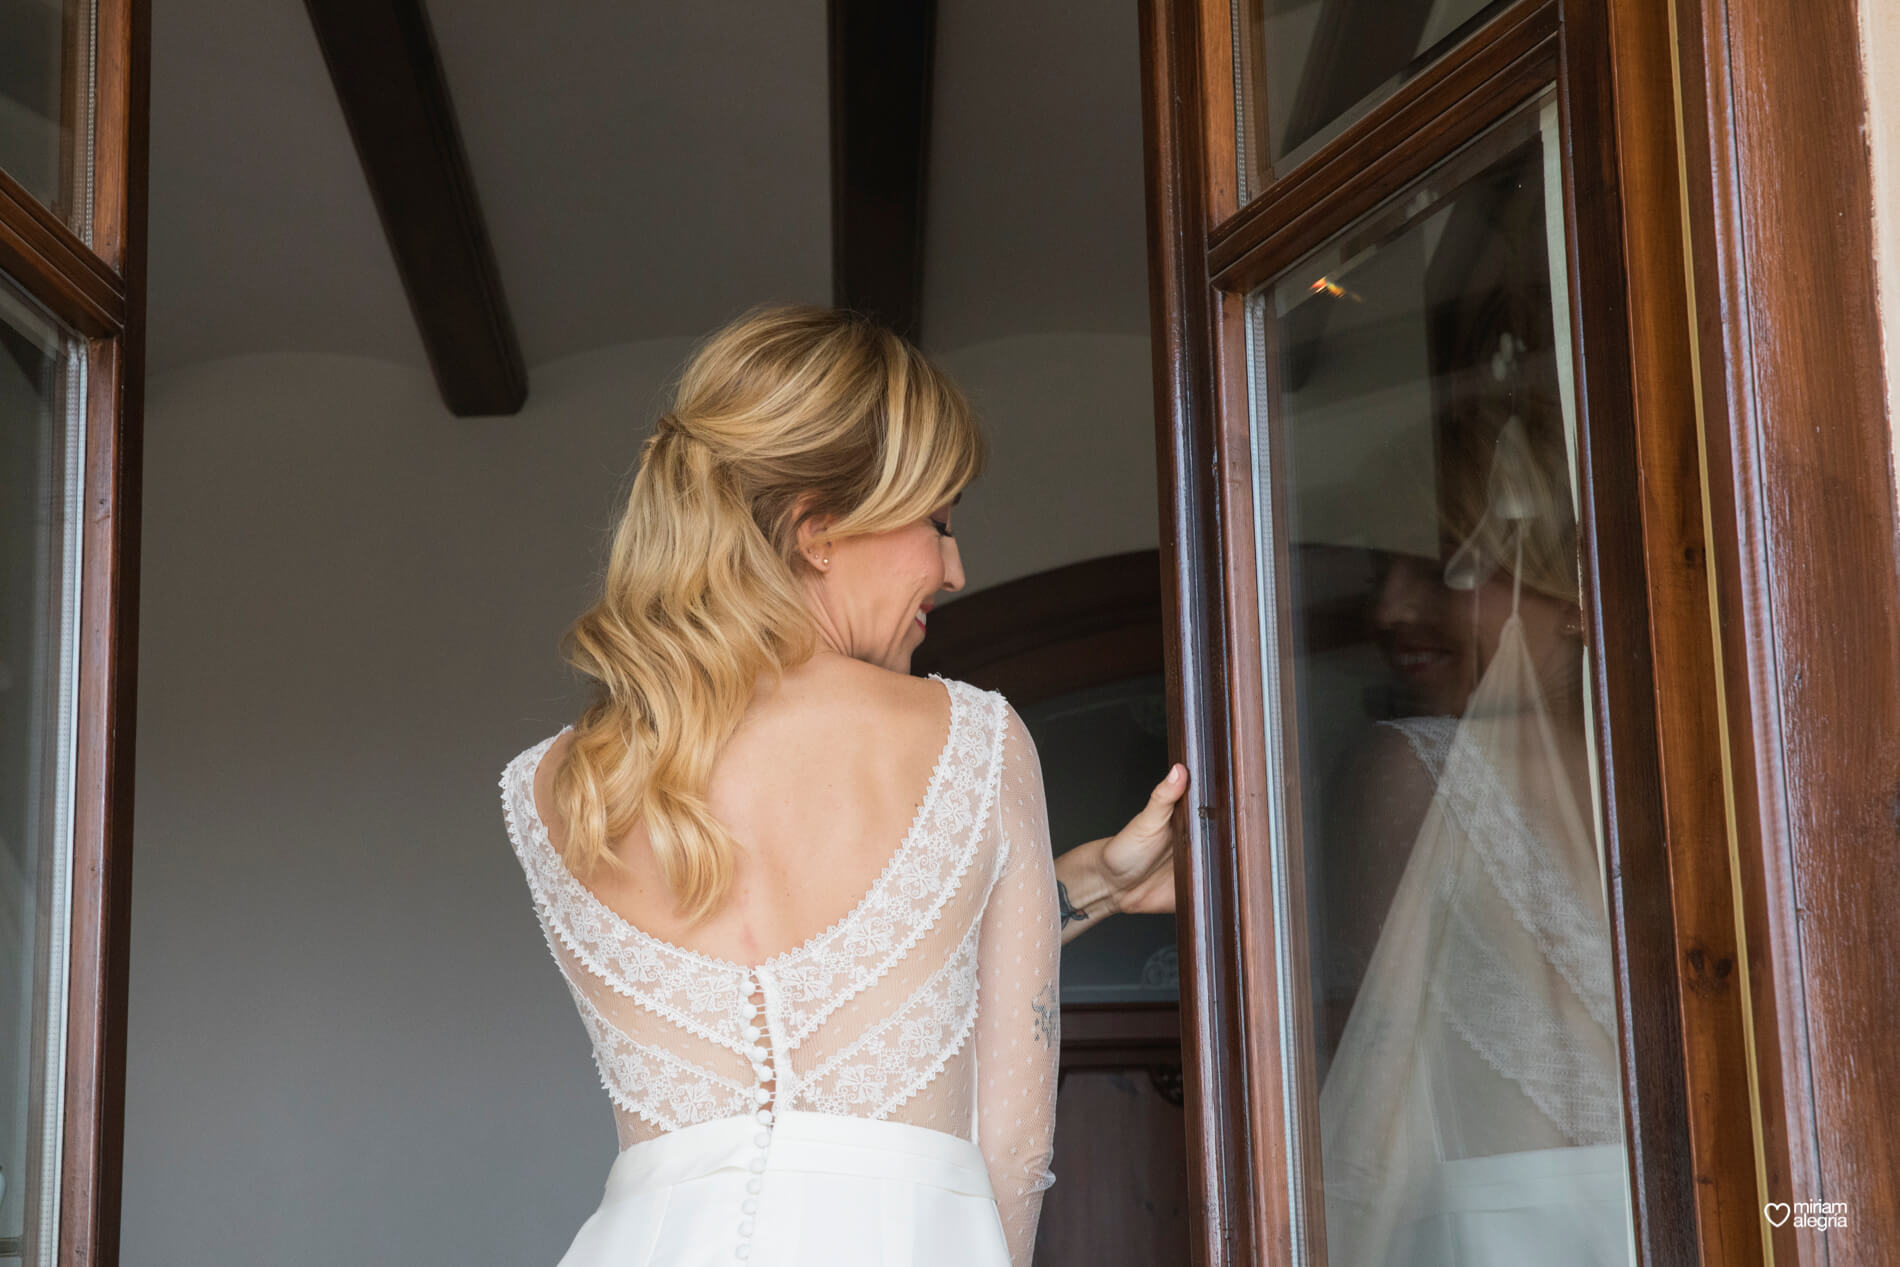 la-boda-de-alemc7-miriam-alegria-fotografos-boda-murcia-22